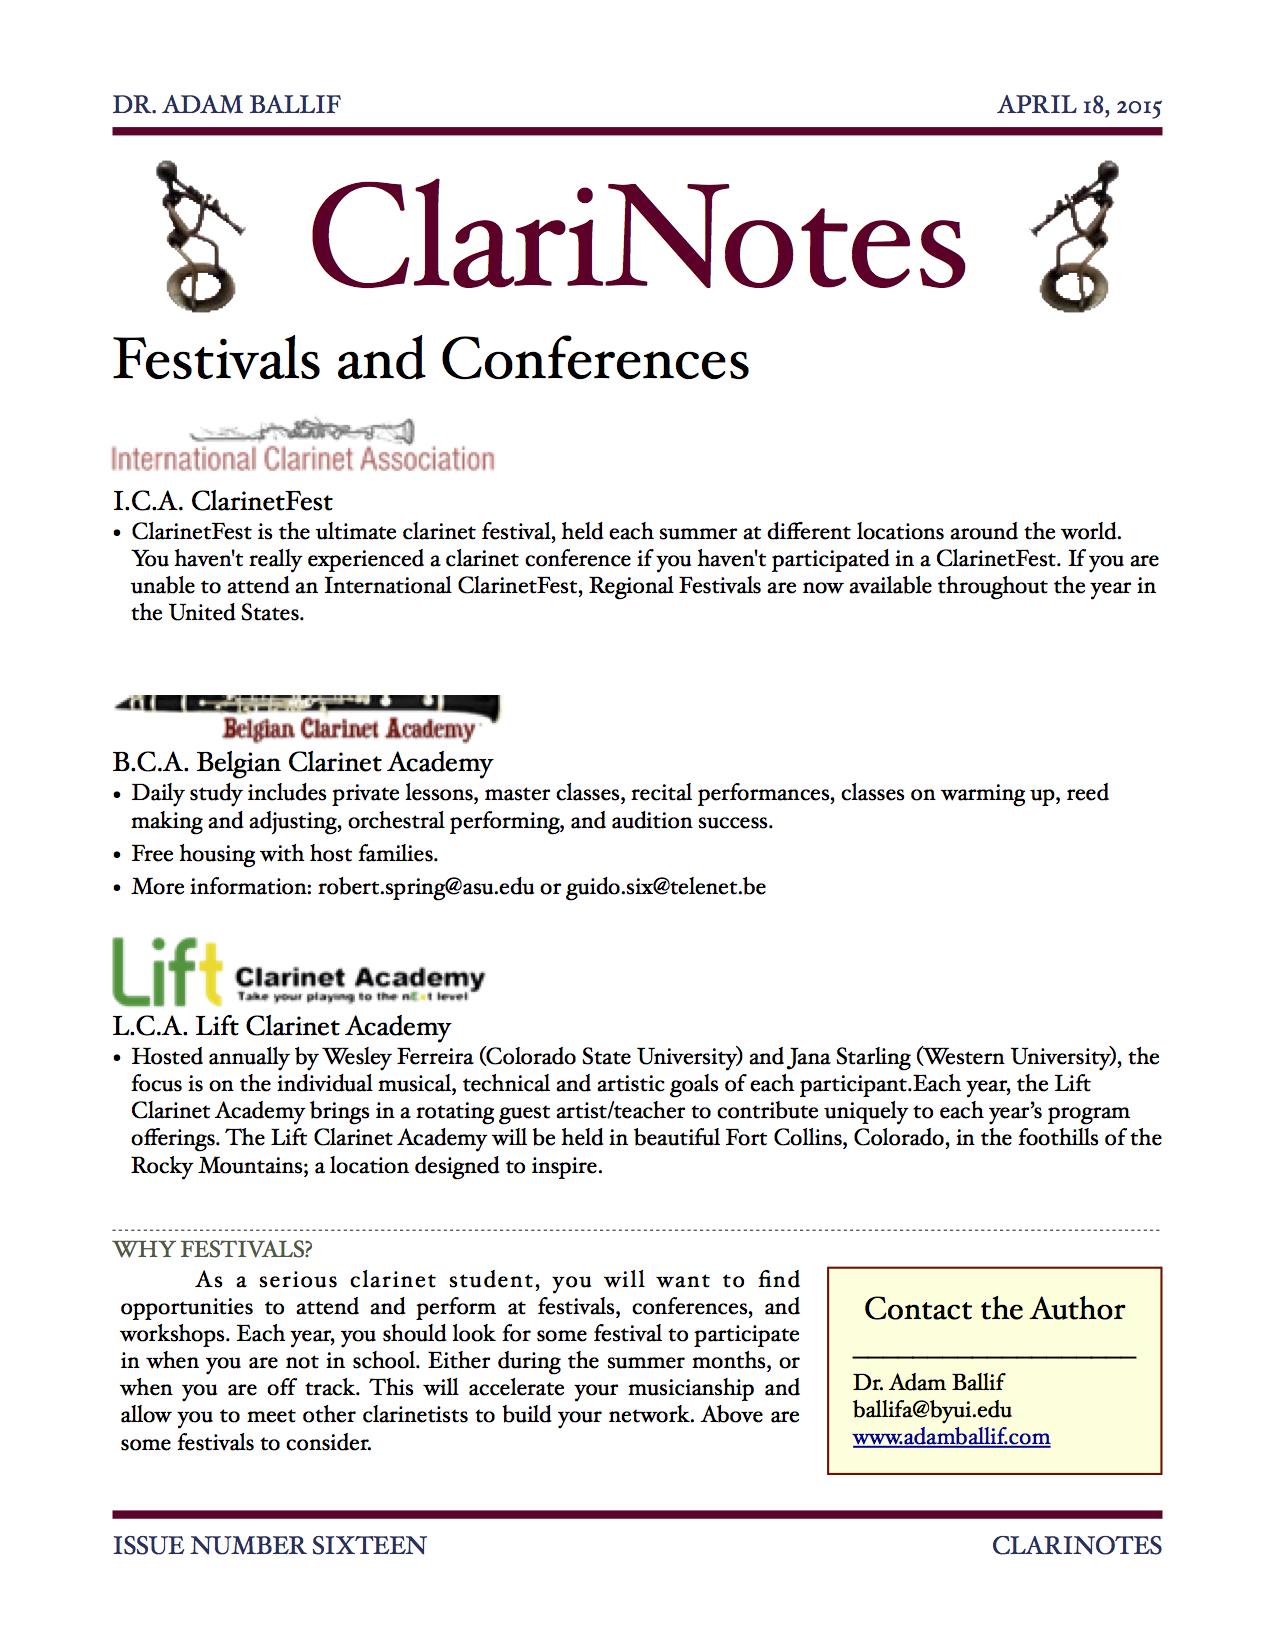 Issue Sixteen - Festivals